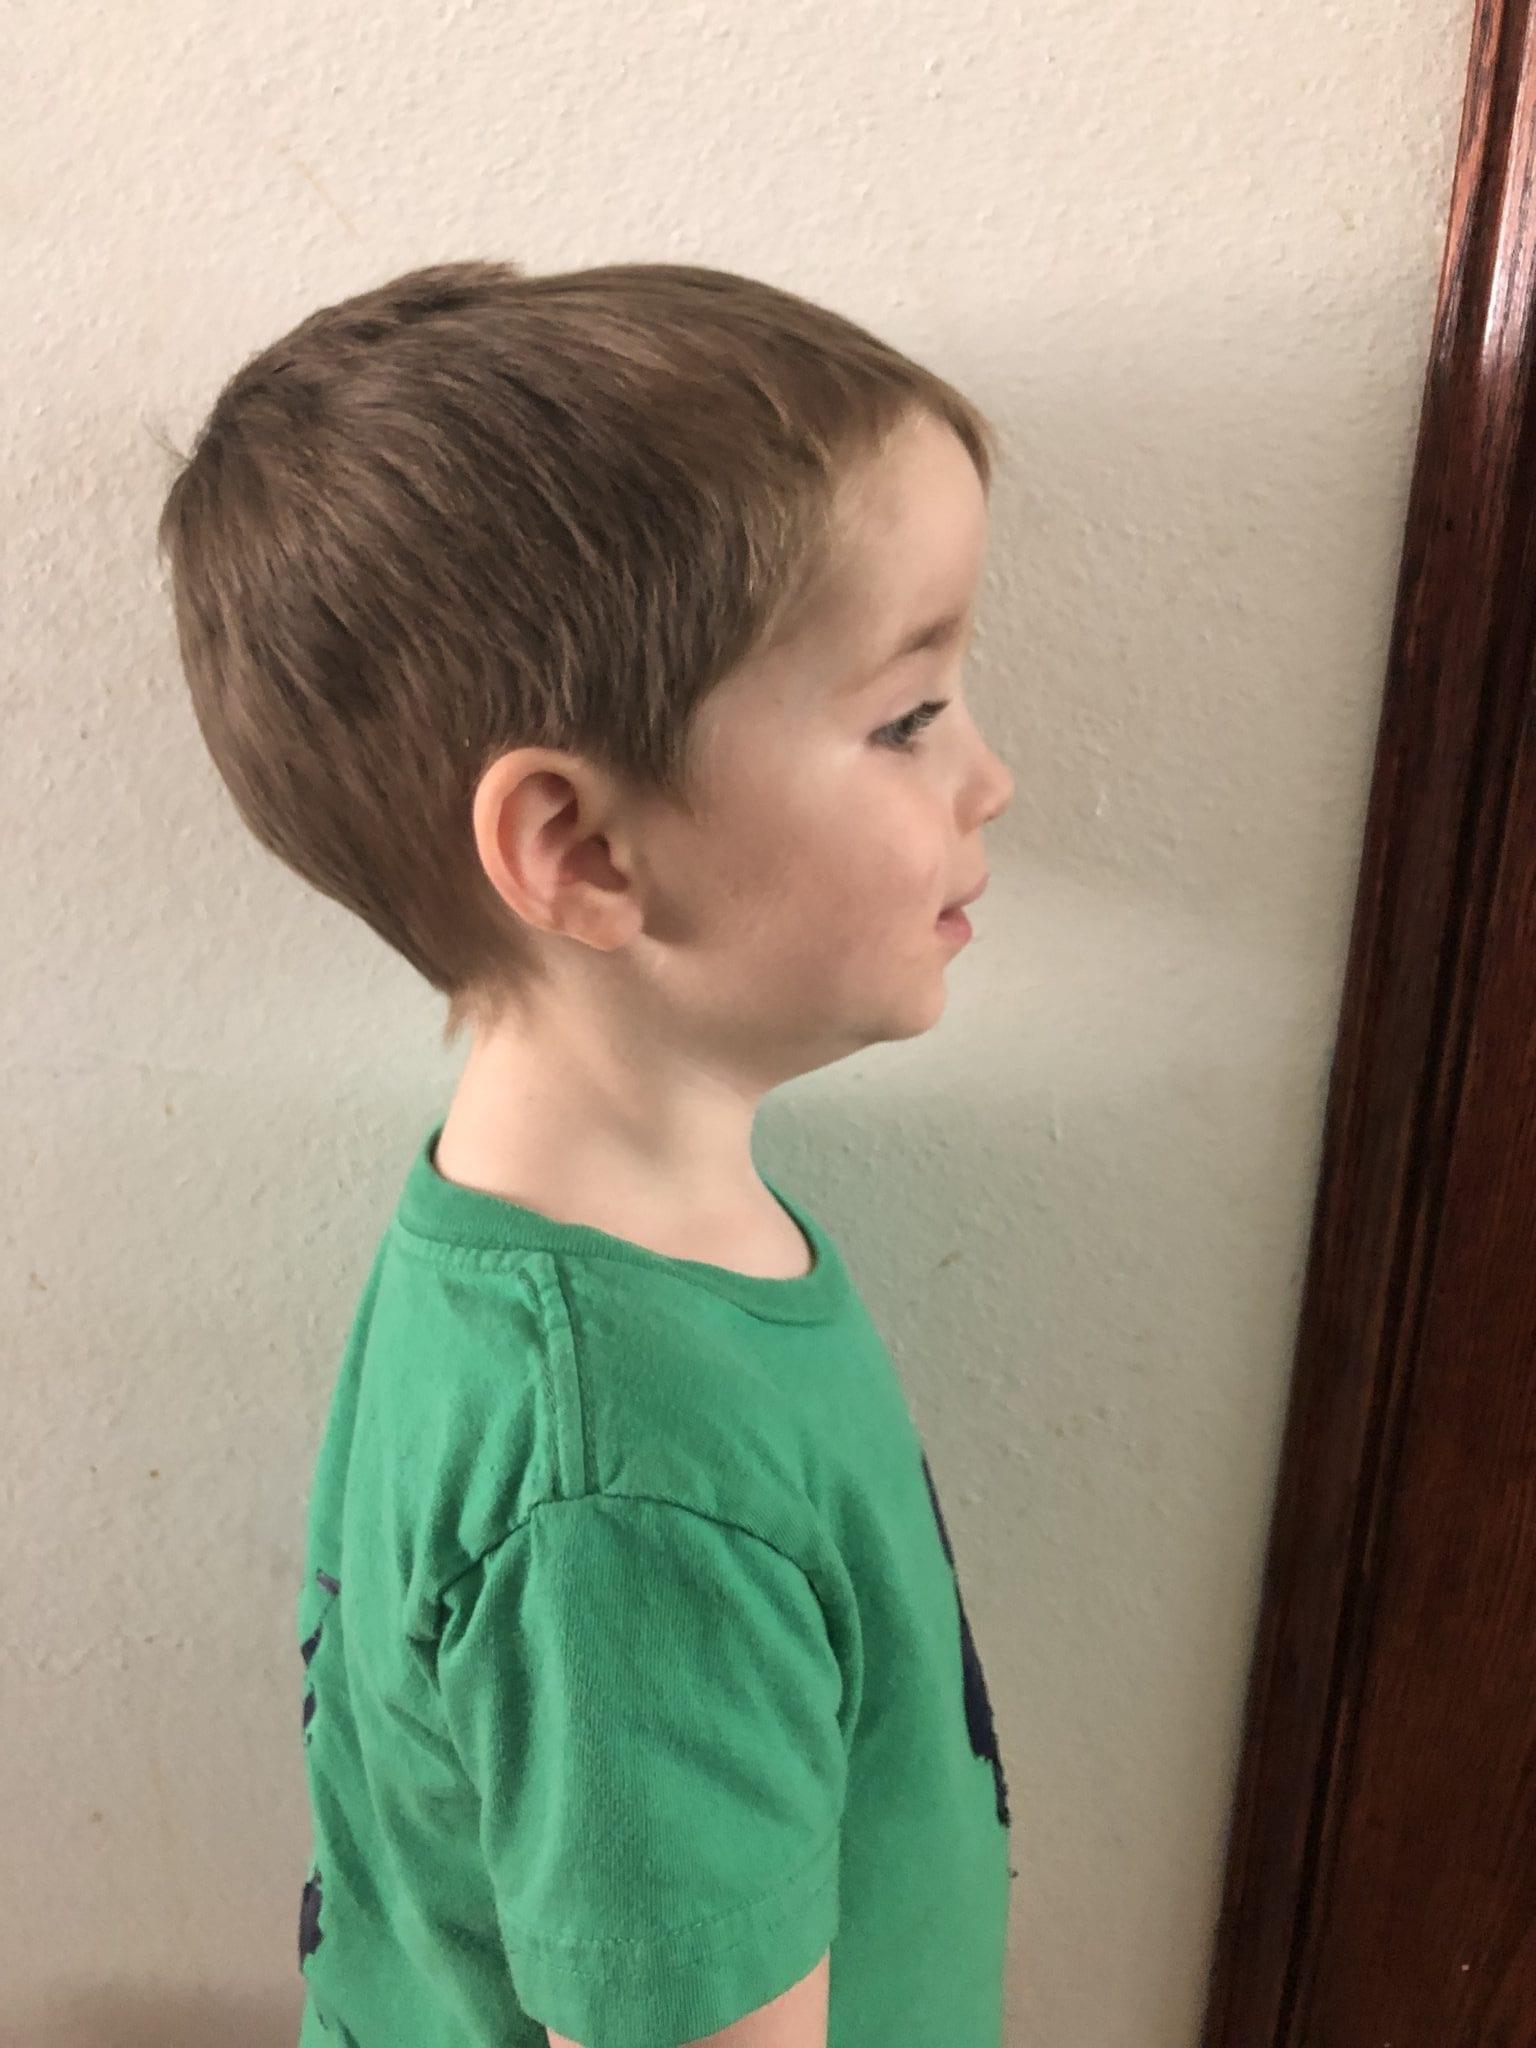 little boy standing by wall